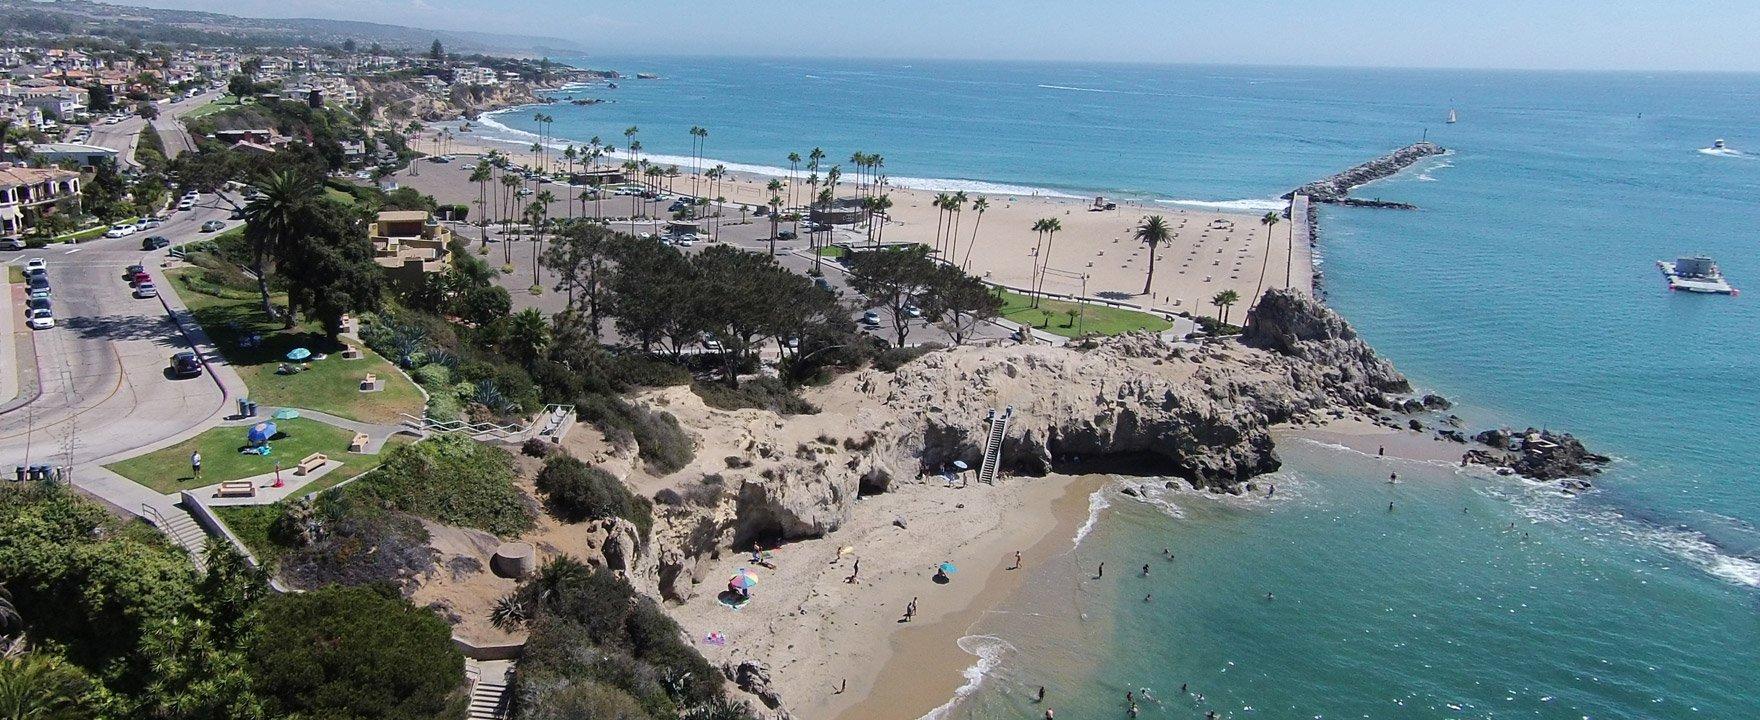 houses for sale in corona del mar california